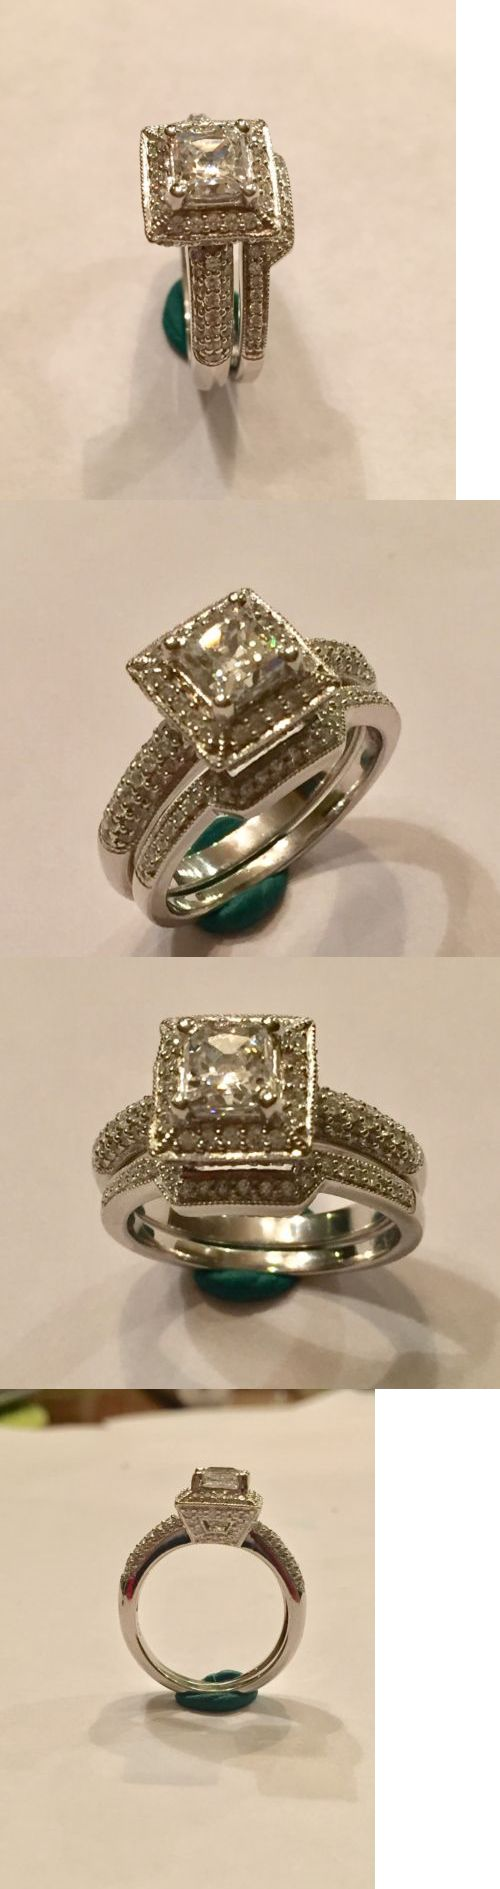 ebay eheringe ebay wedding ring sets CZ Moissanite and Simulated Sterling Silver Wedding Ring Engagement Ring Set Princess Cut Halo